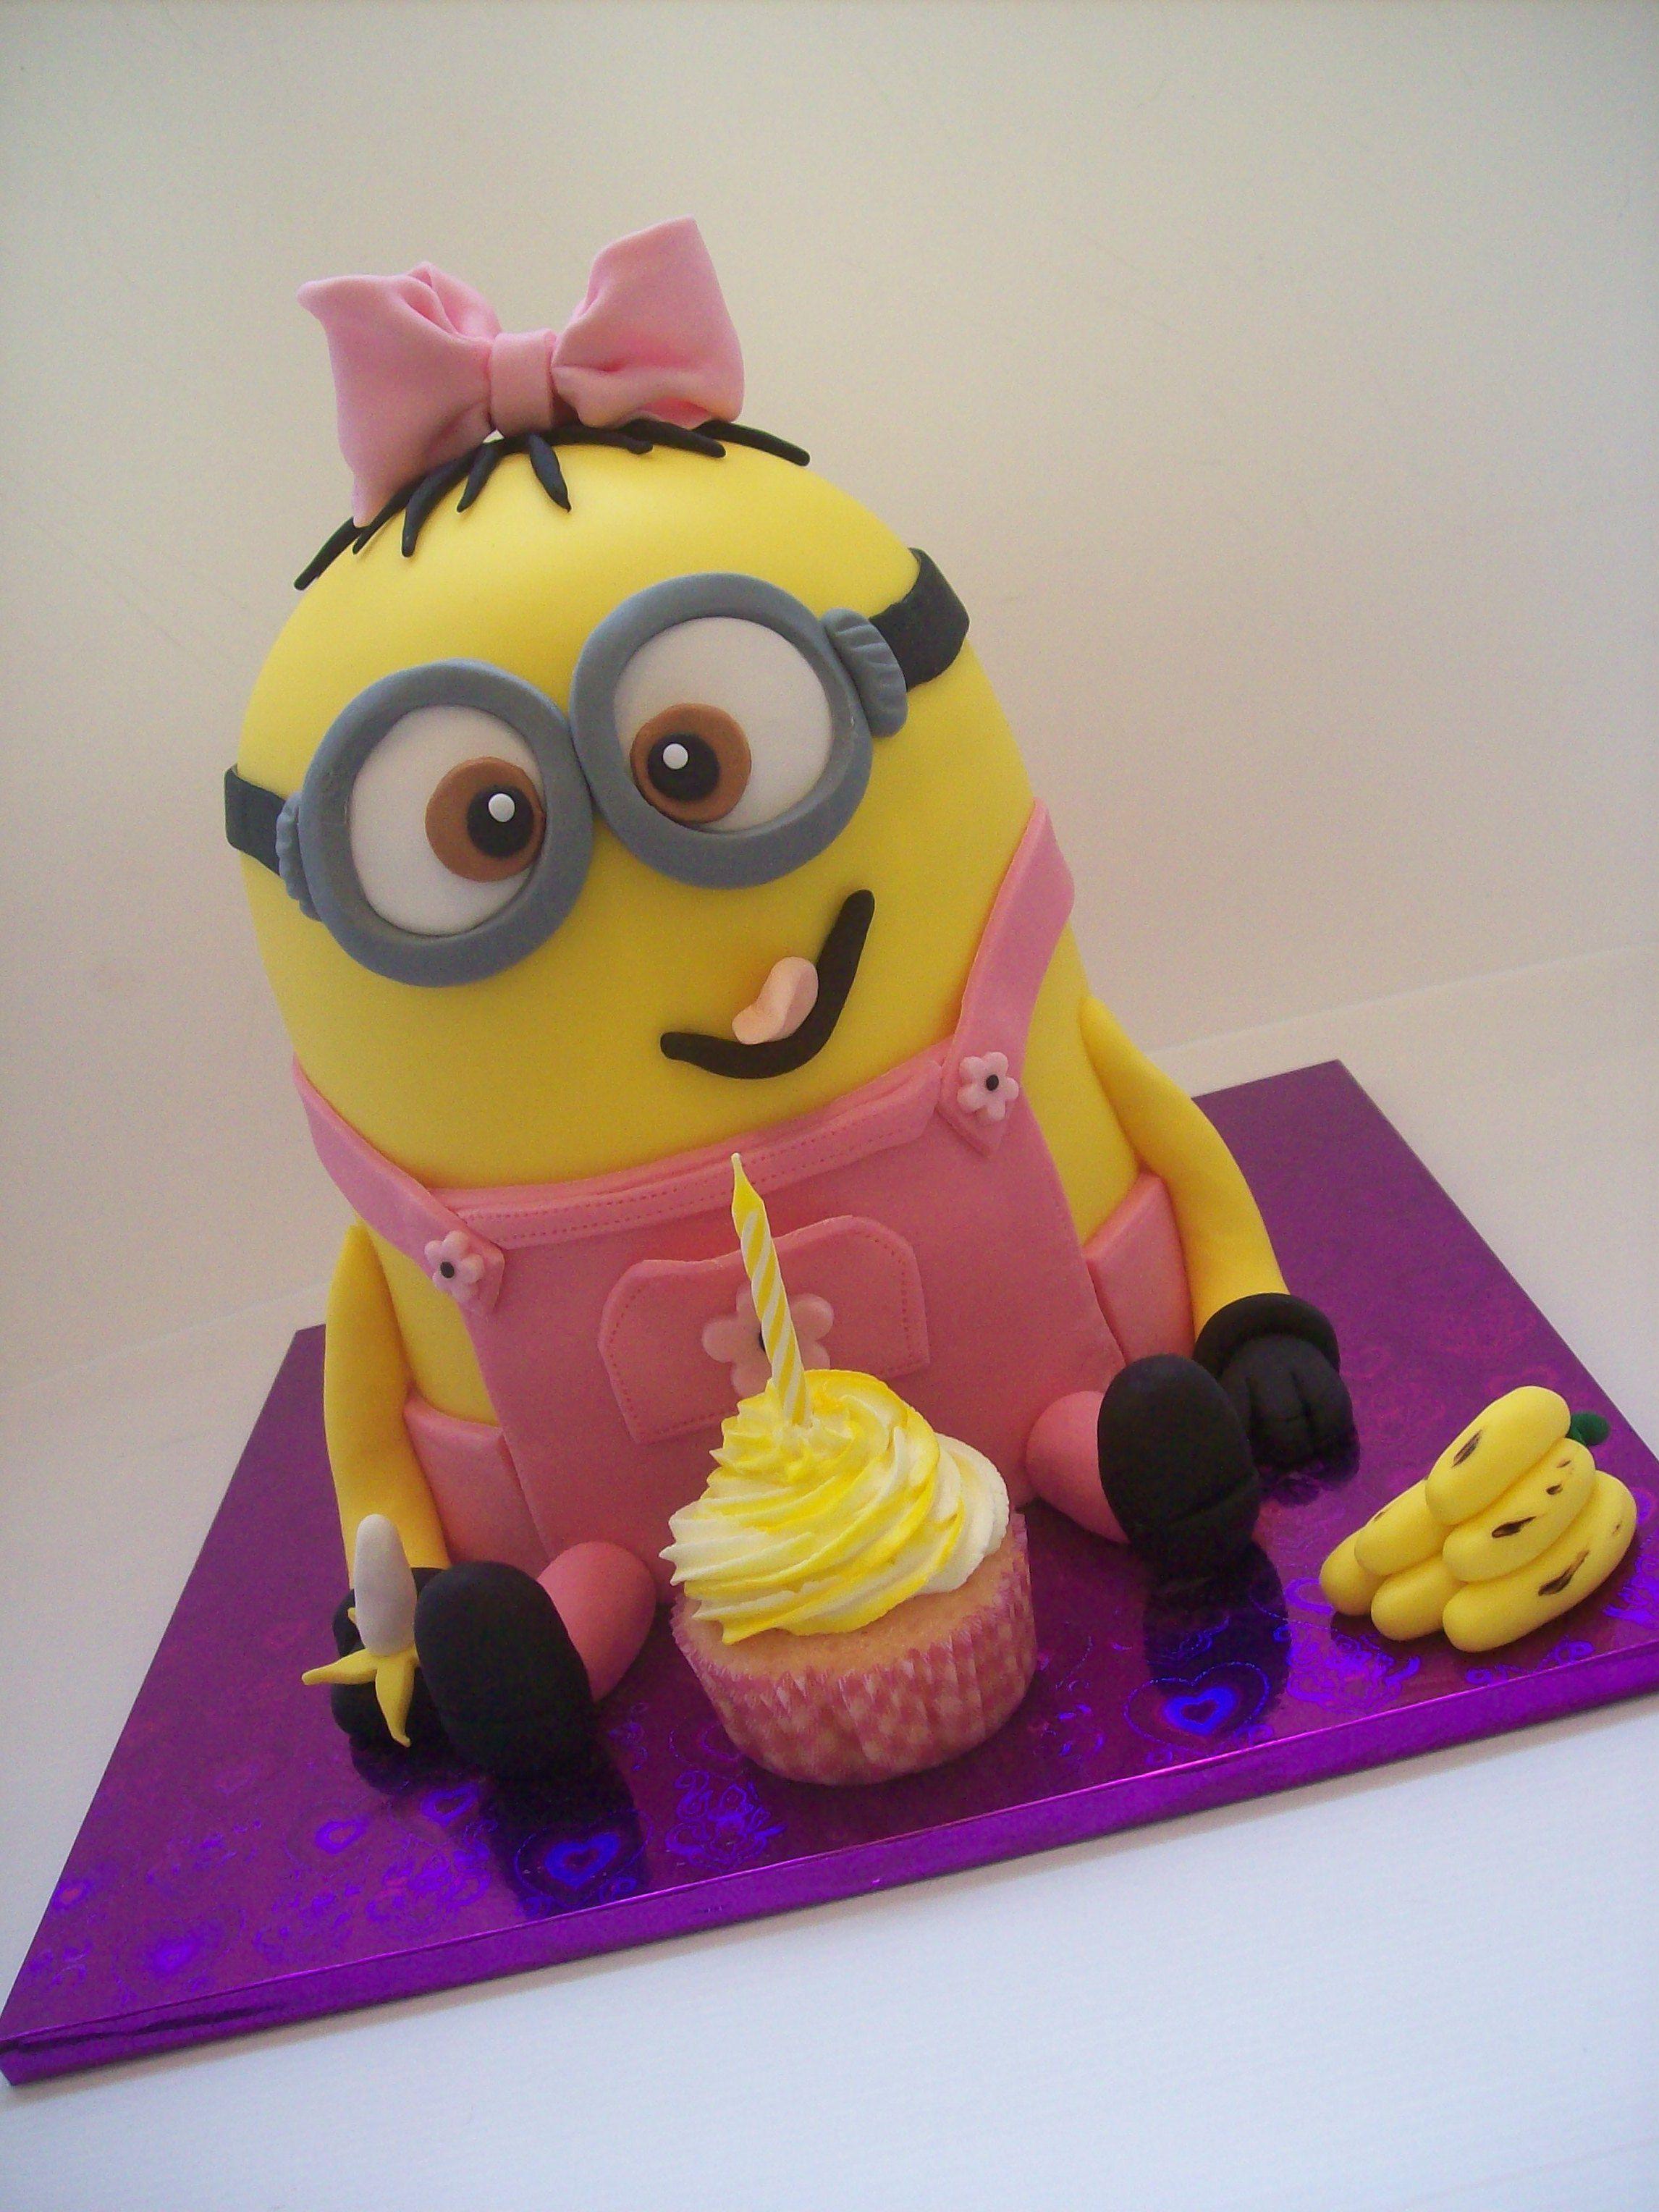 Girl Minion Cake 295 Temptation Cakes Temptation Cakes Party